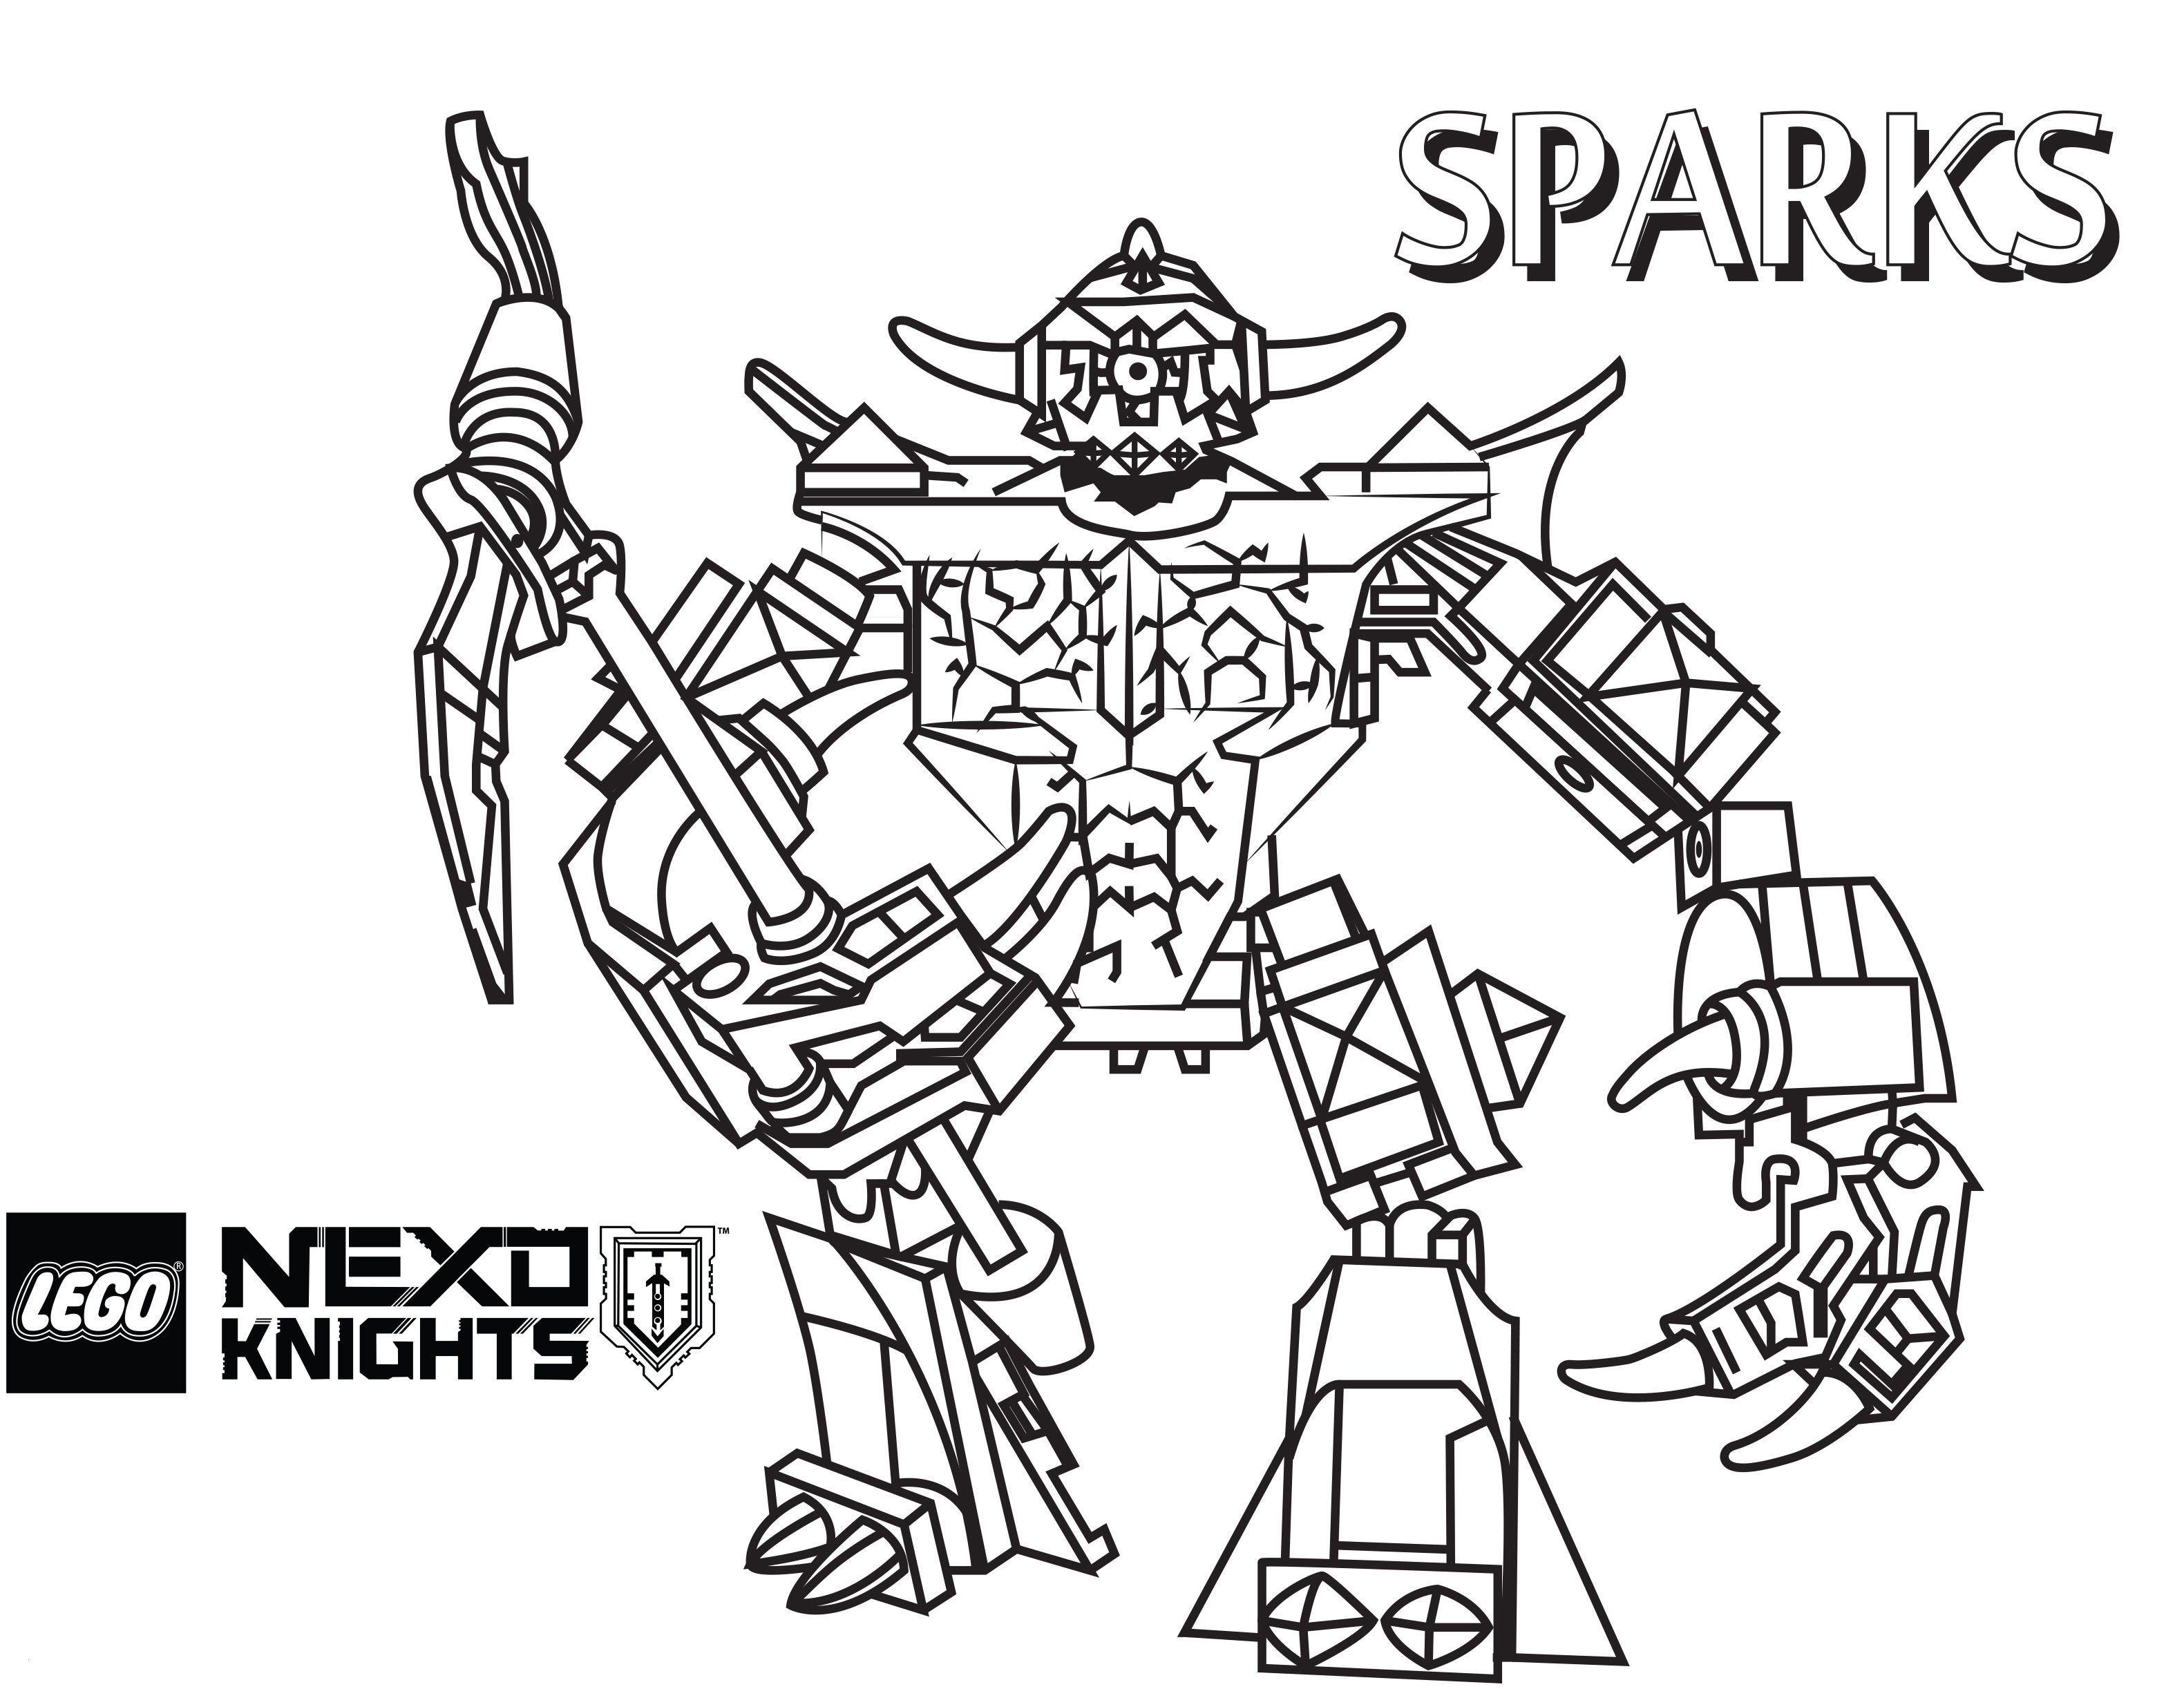 Lego Ninjago Bilder Zum Ausdrucken Neu Nexo Knights Ausmalbilder Zum Drucken Genial Lego Ninjago Schön Stock